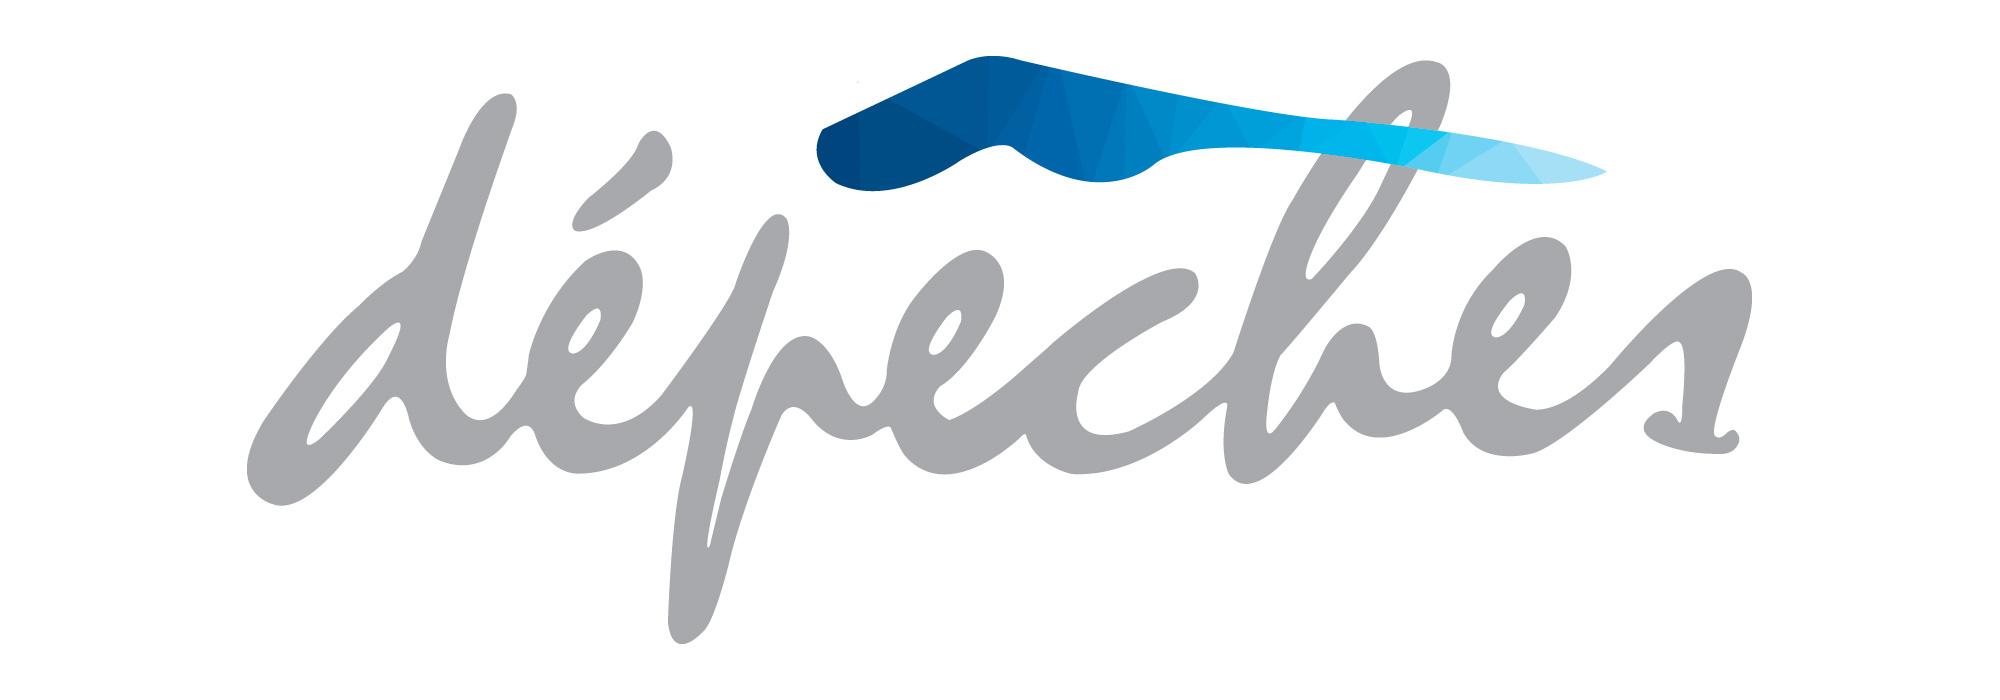 Logo Depeches Vf3